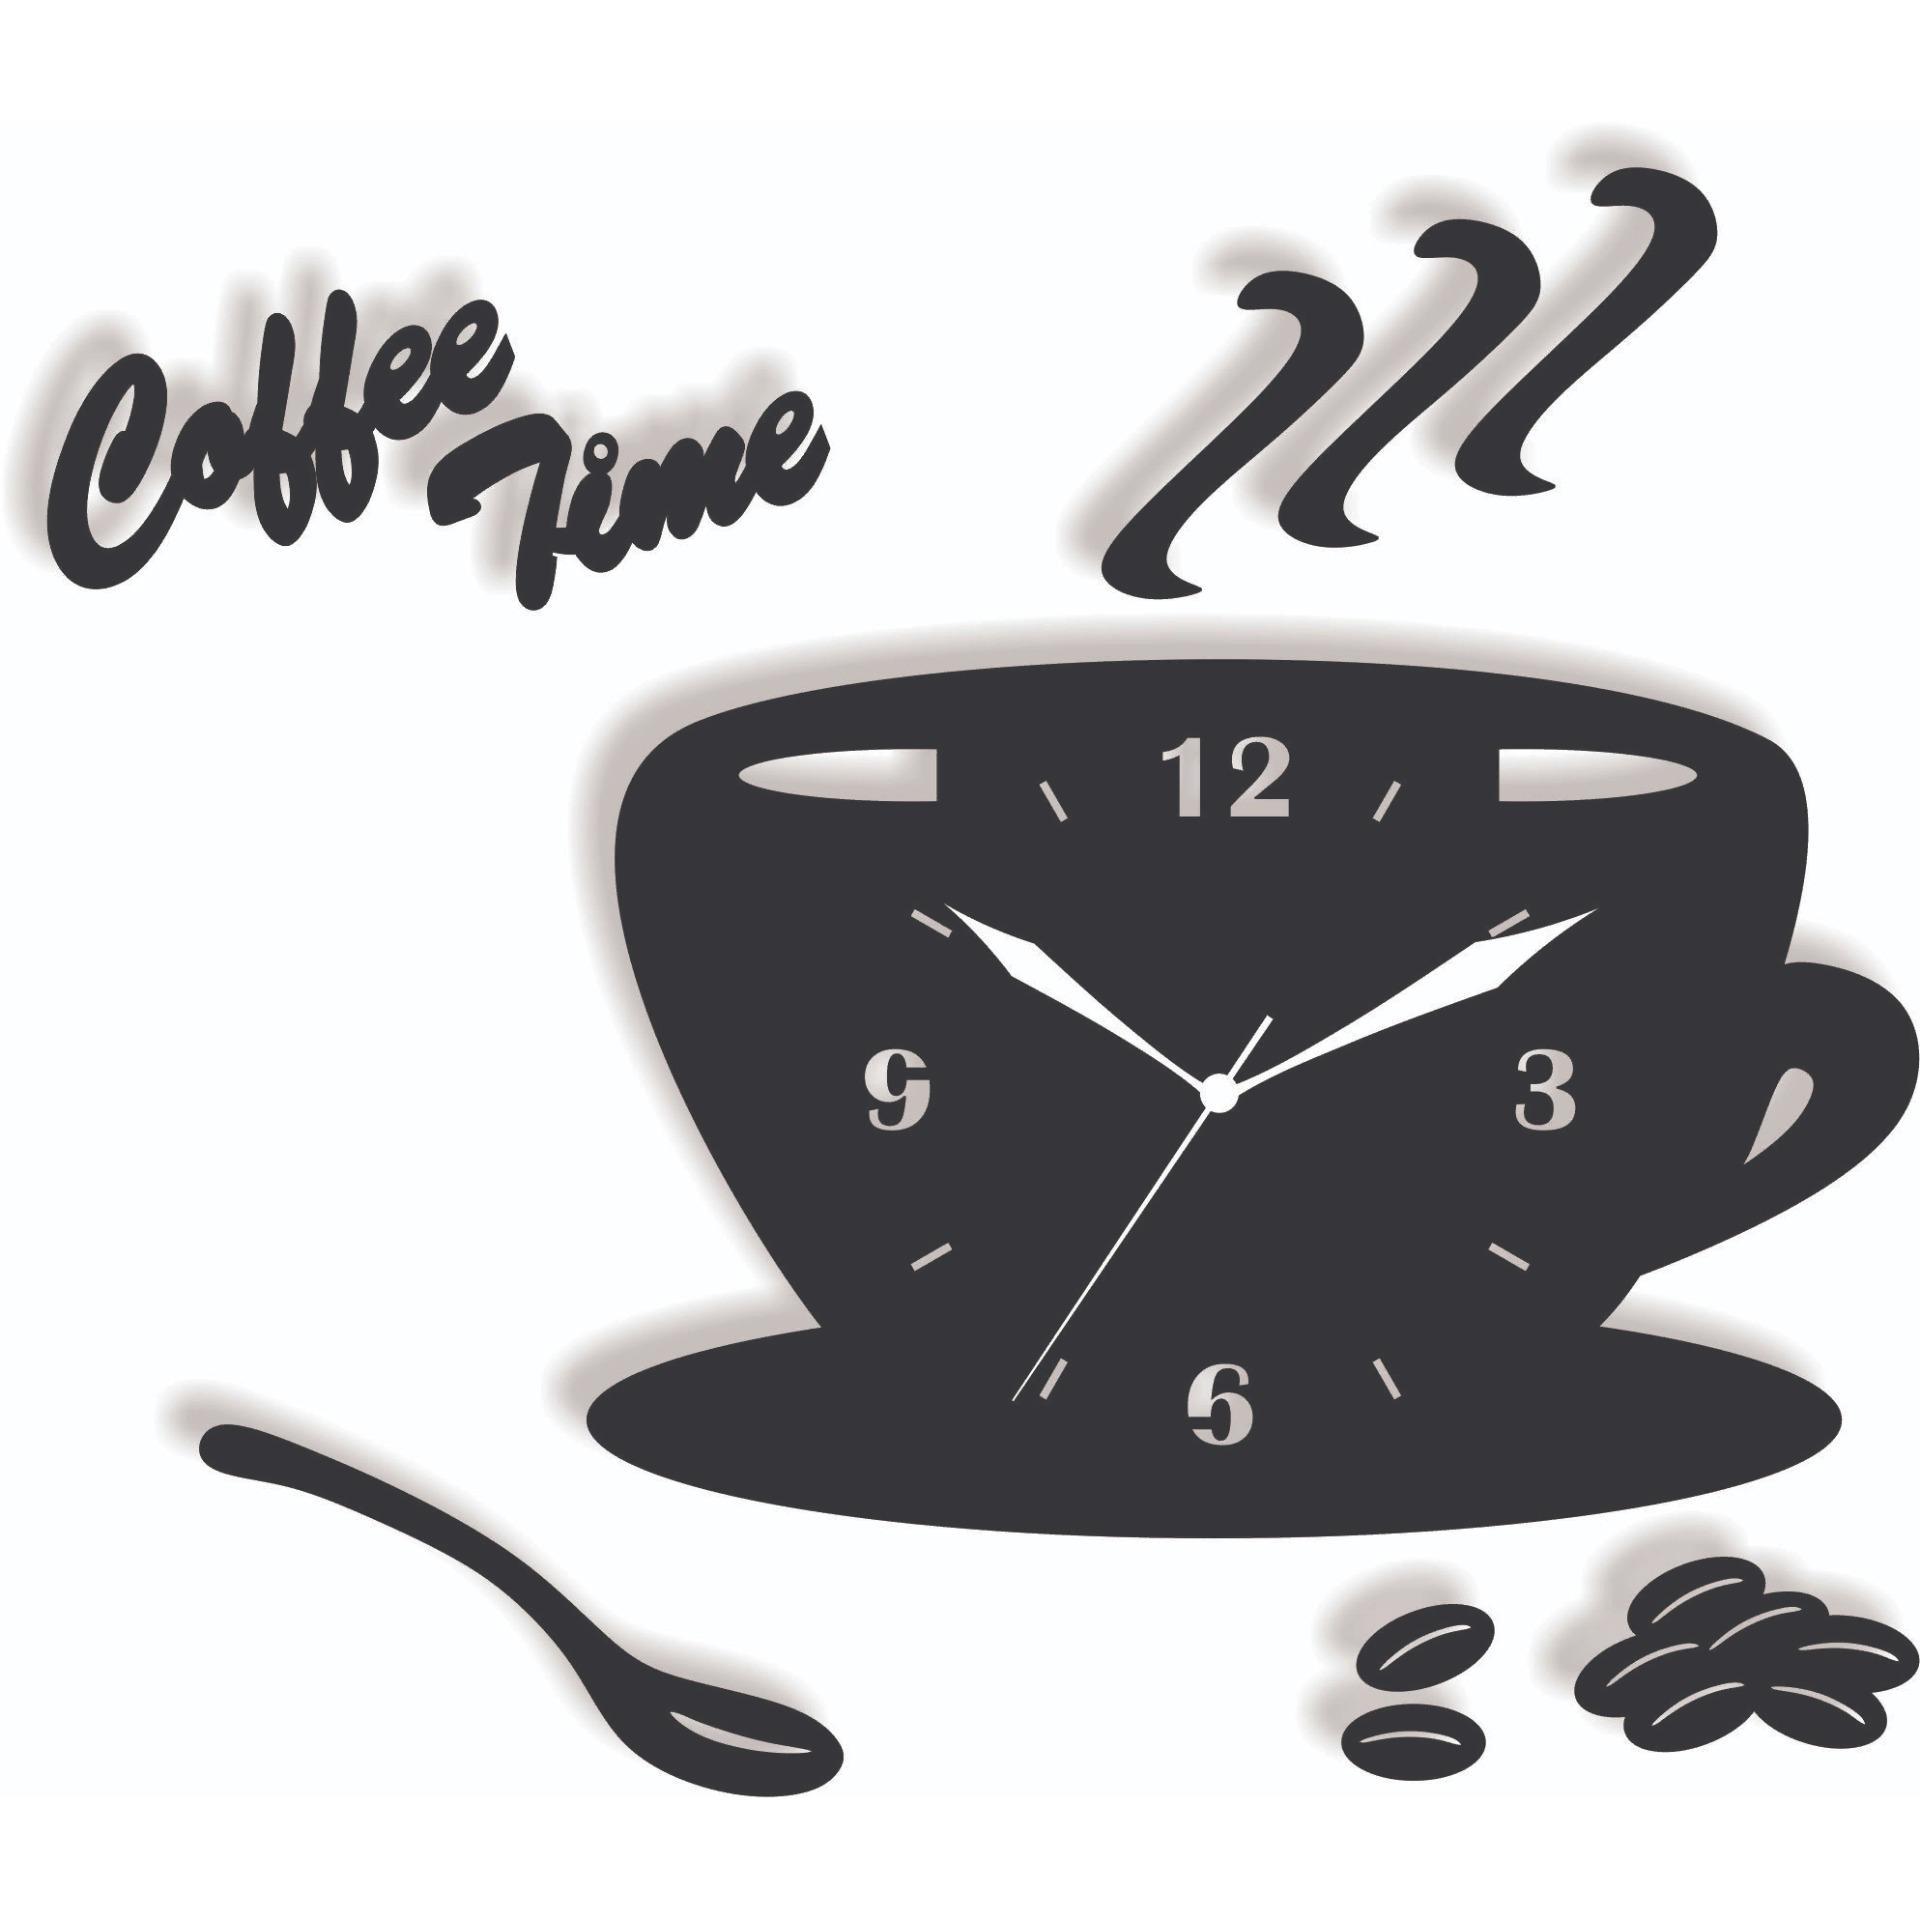 Coffe Time Kitchen Clock 3d Modern Laser Cut Wooden Wall Clock Buy Online At Best Prices In Pakistan Daraz Pk